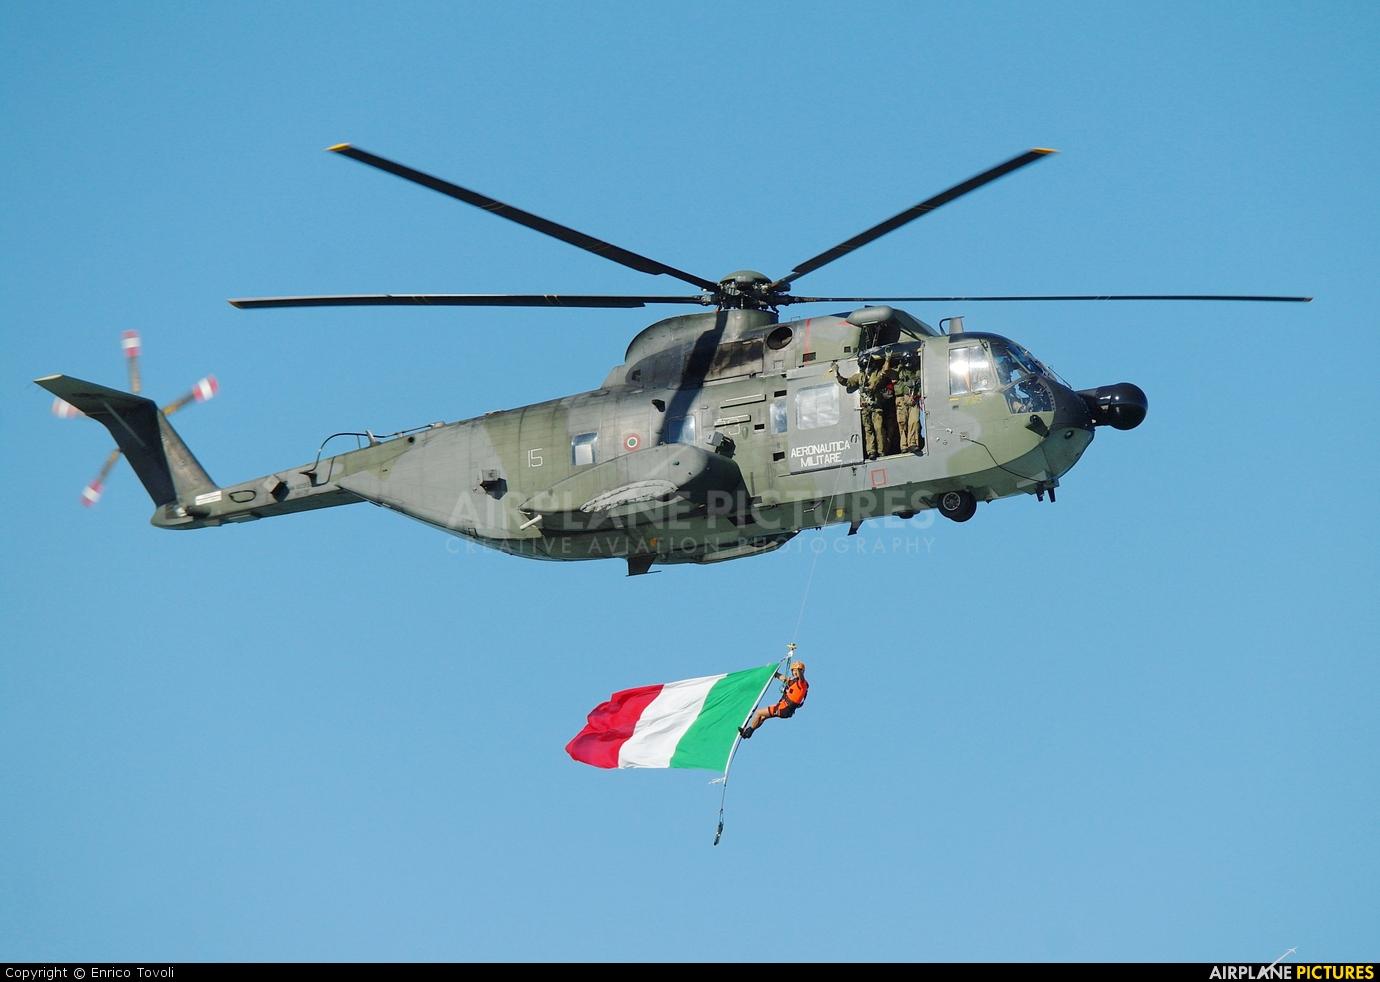 Italy - Air Force MM81349 aircraft at Off Airport - Italy